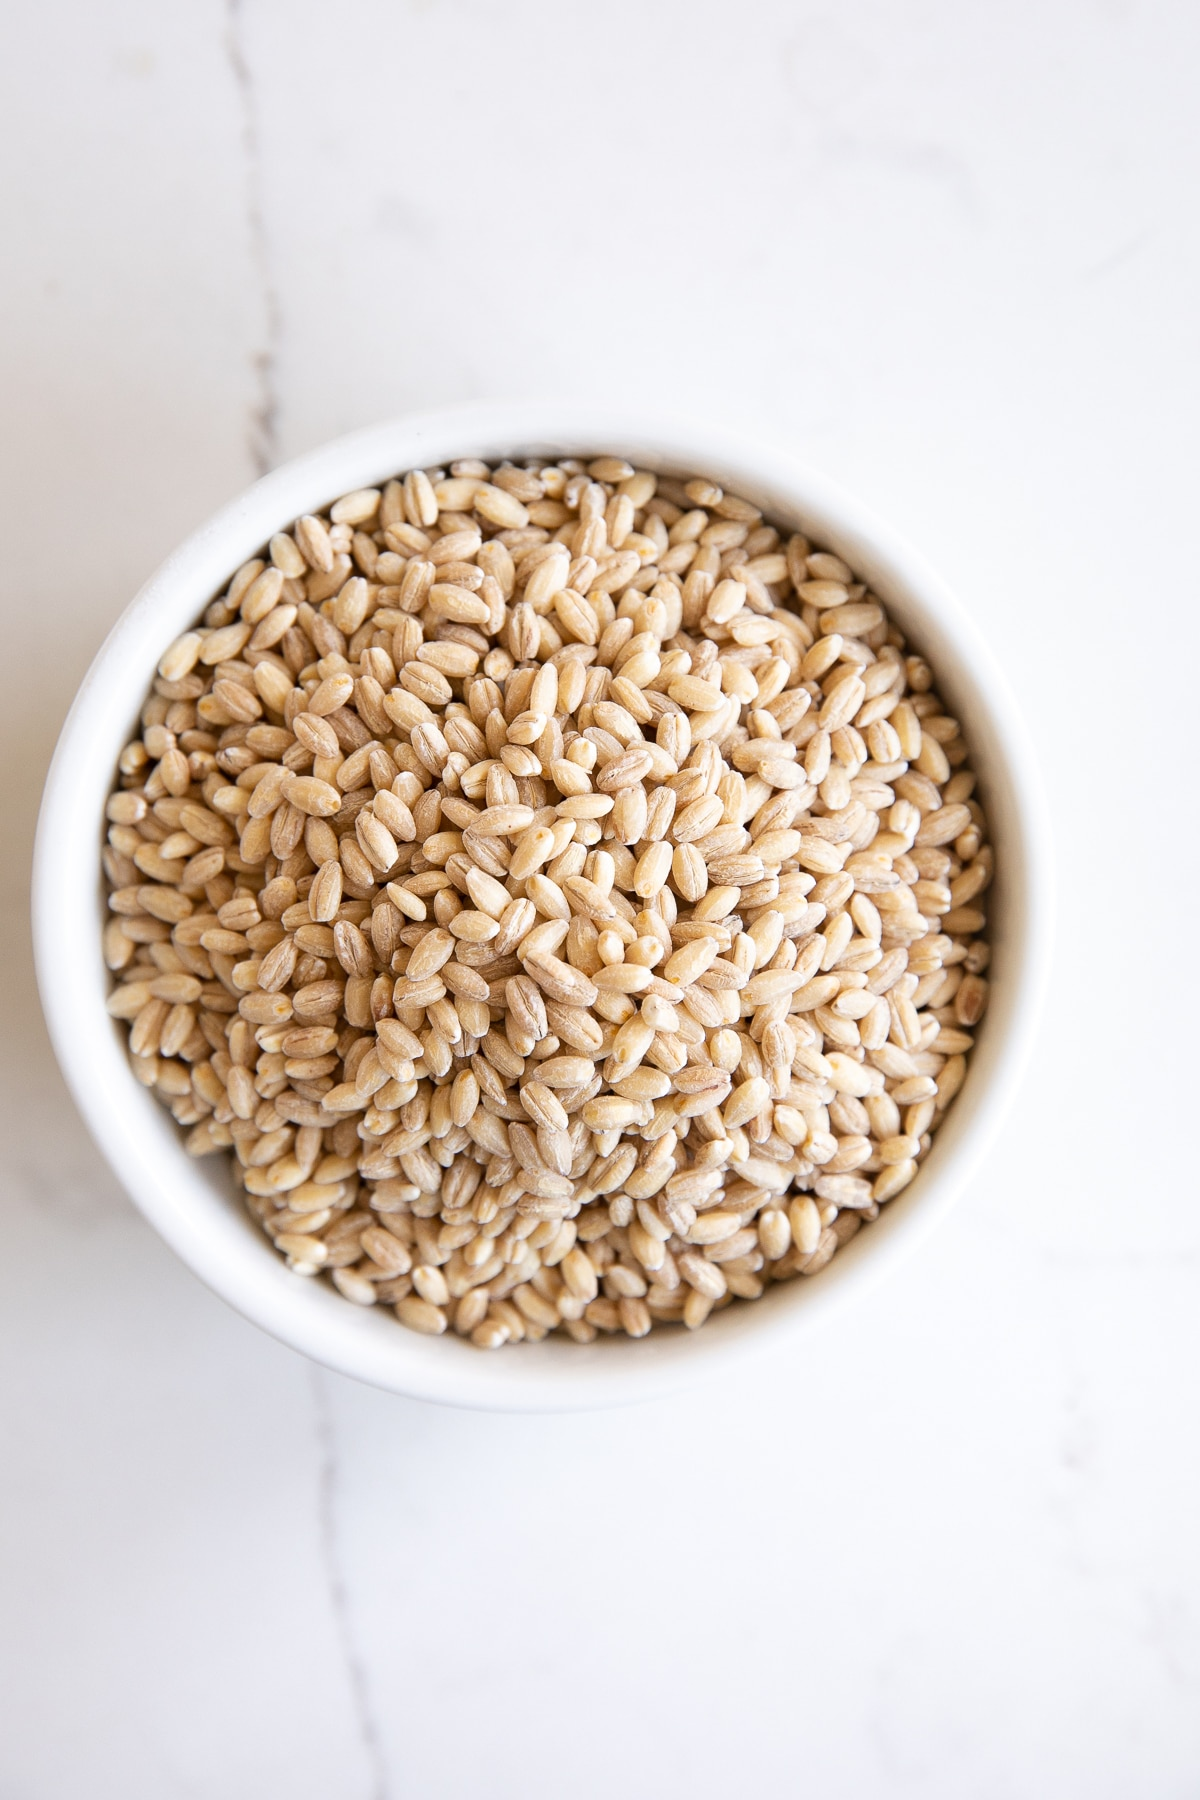 Small white ramekin filled with pearled barley.